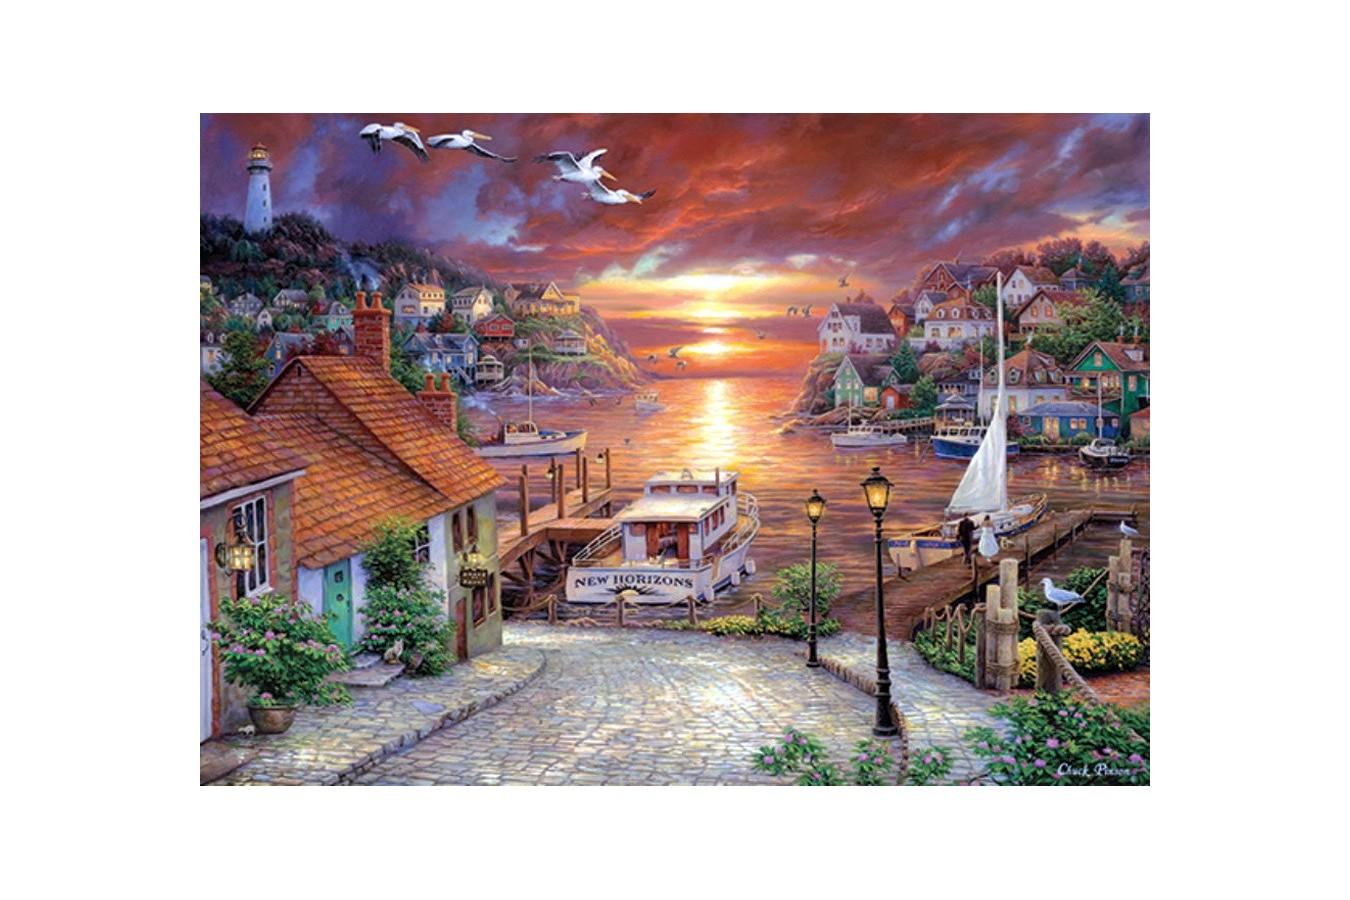 Puzzle Anatolian - New Horizon, 1500 piese (4522)